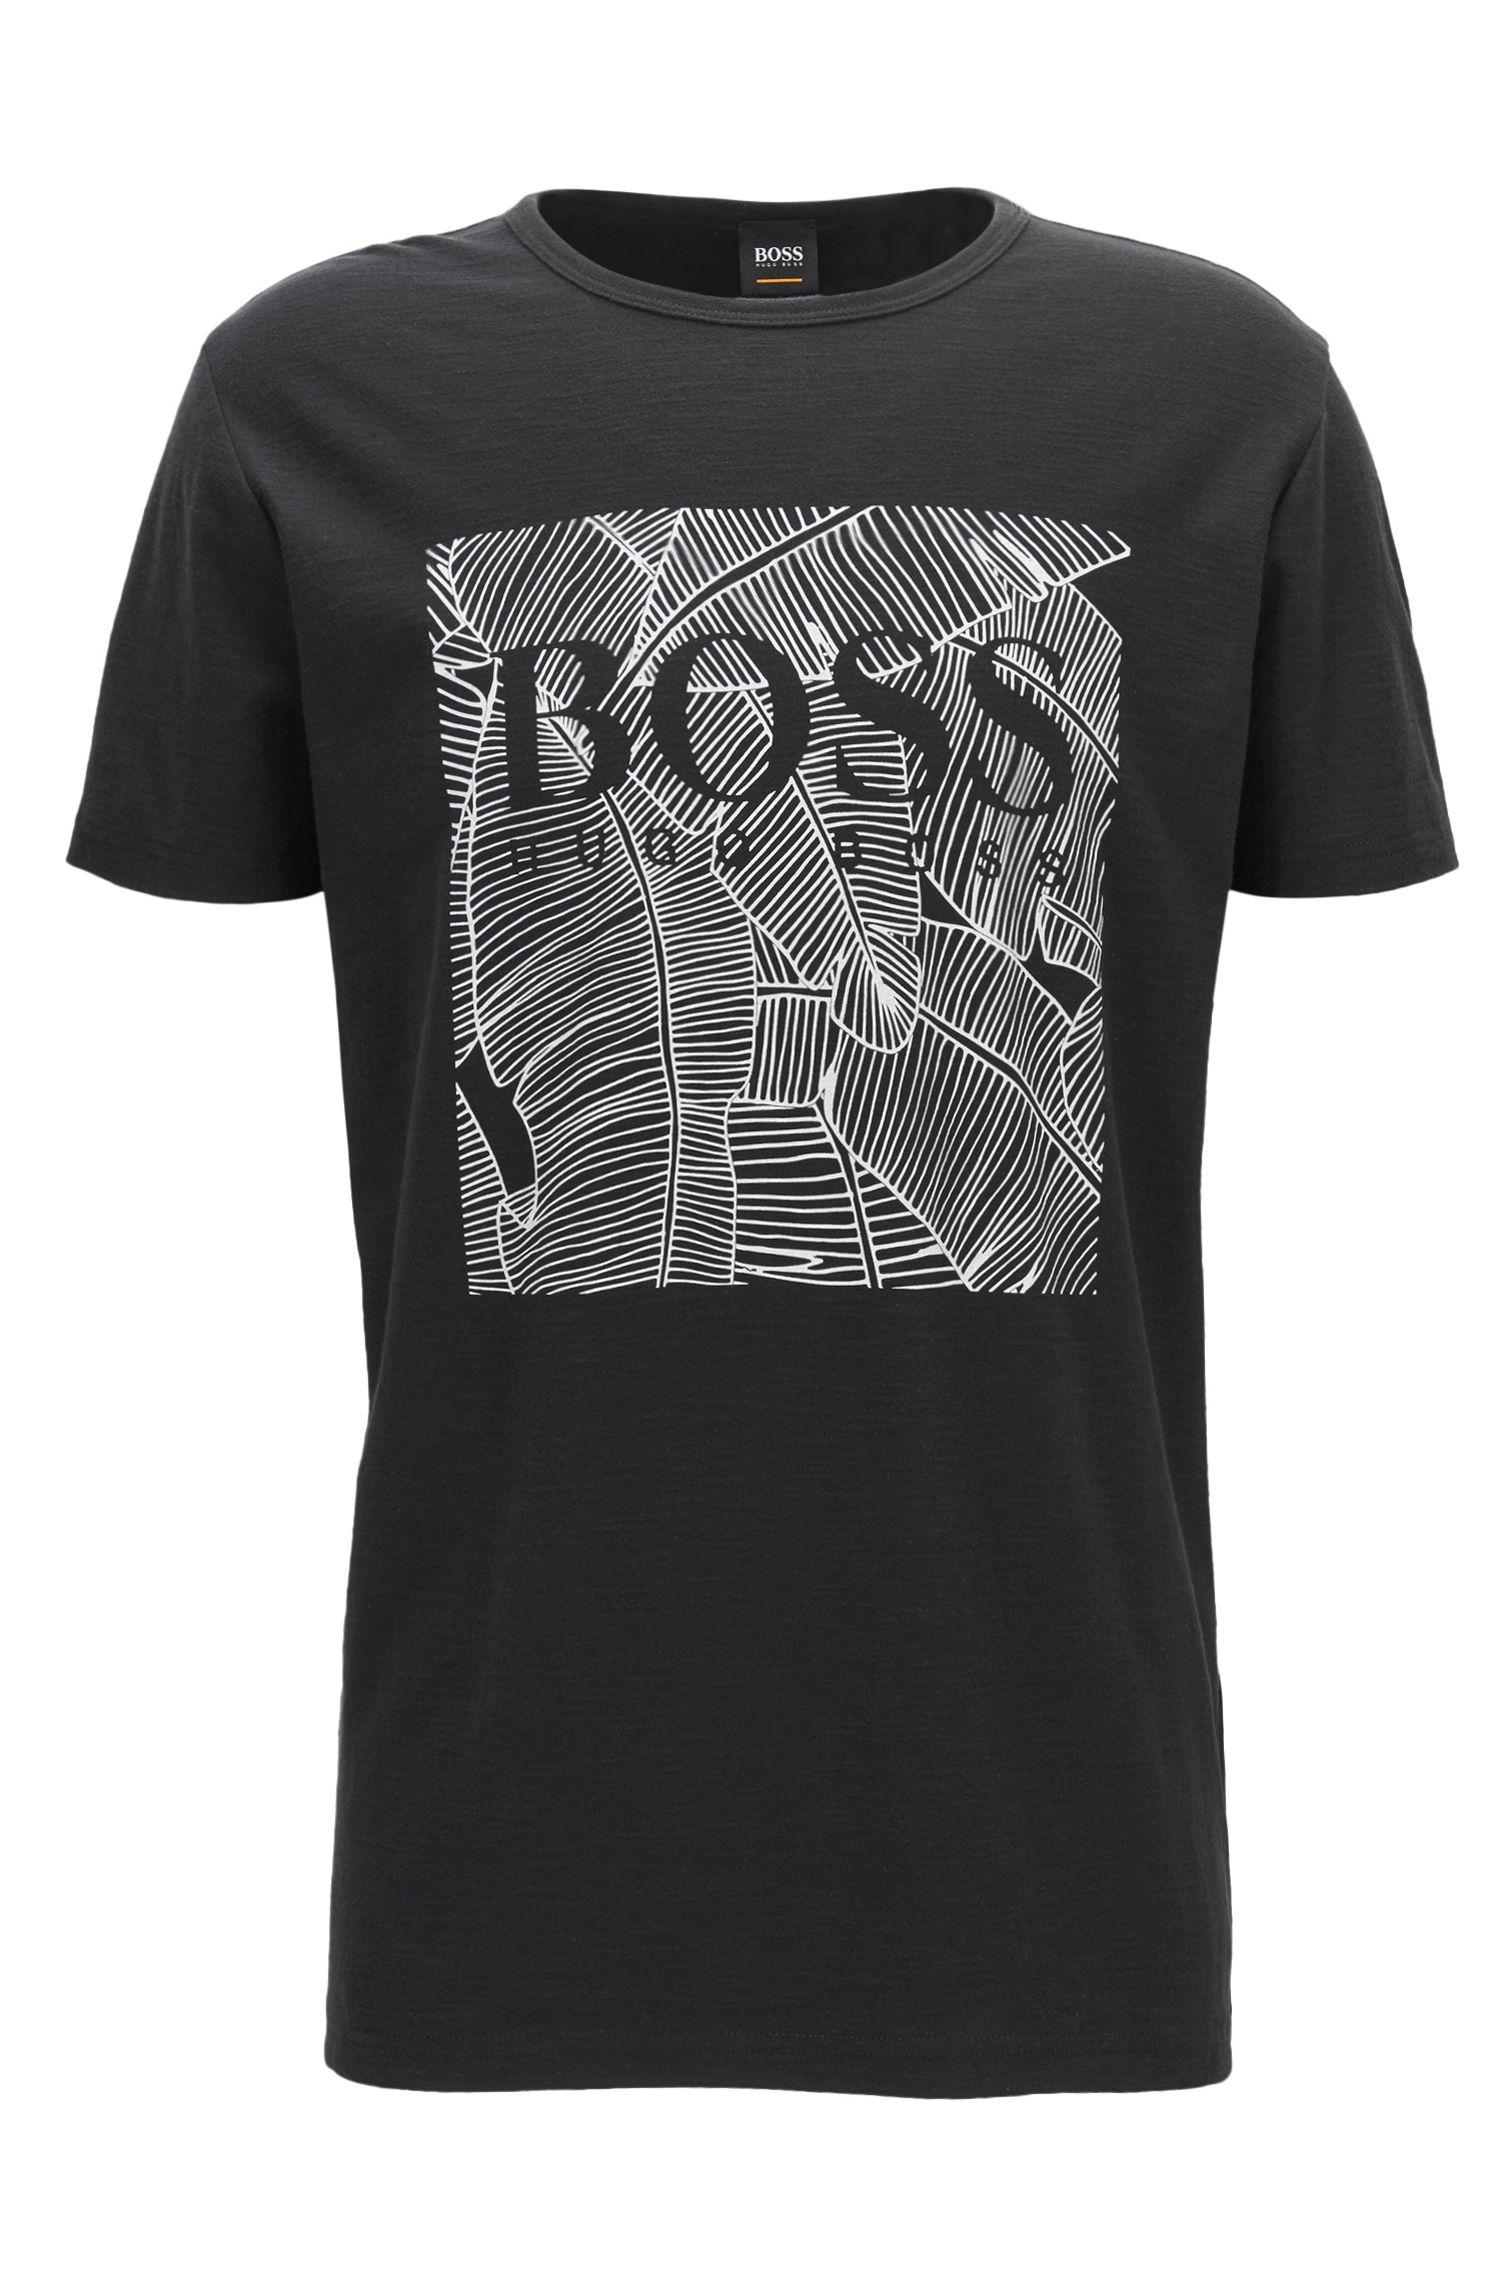 Leaf-Print Cotton Graphic T-Shirt   Tarit